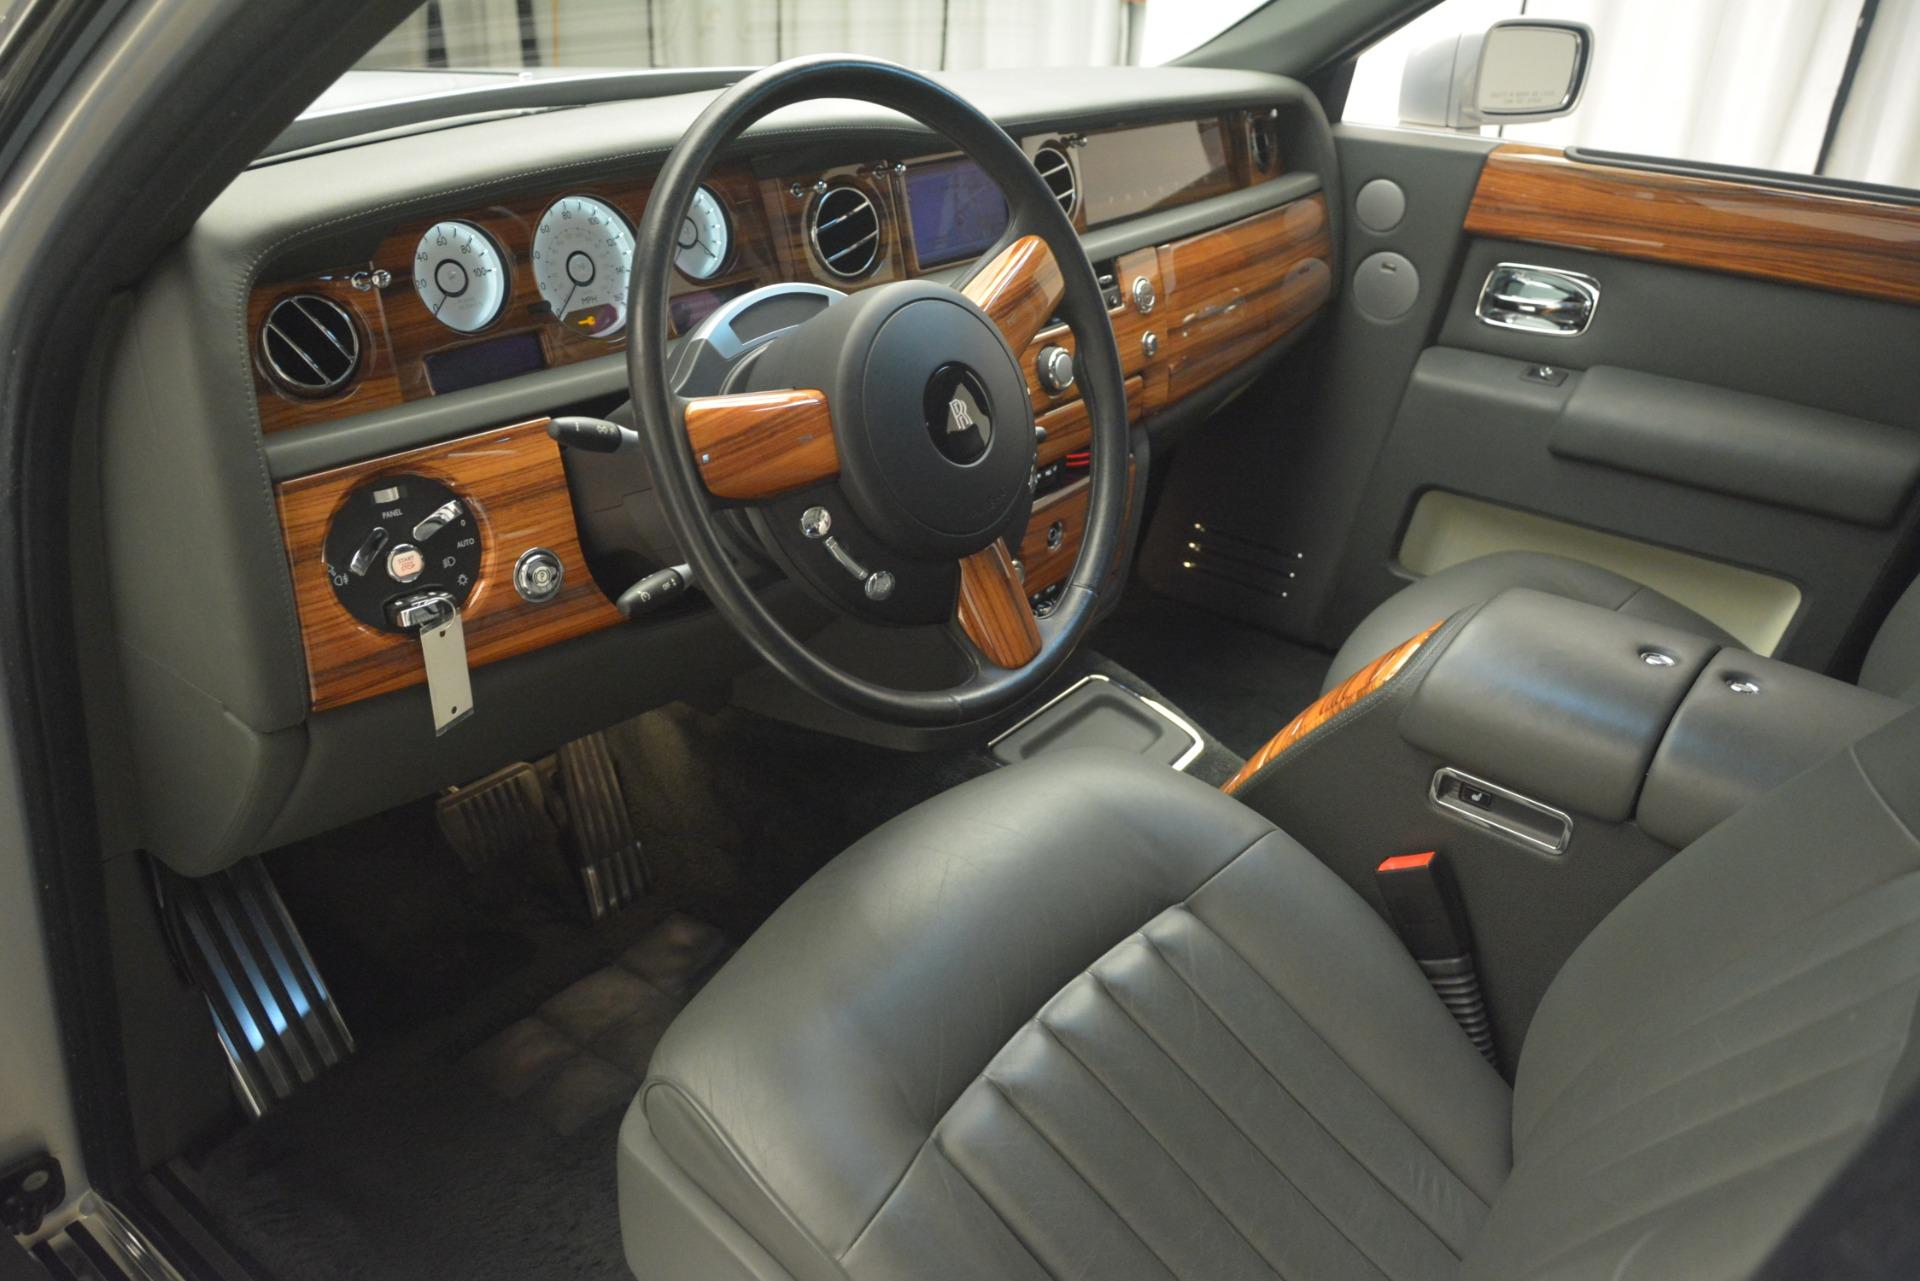 Used 2007 Rolls-Royce Phantom  For Sale In Greenwich, CT 3089_p16